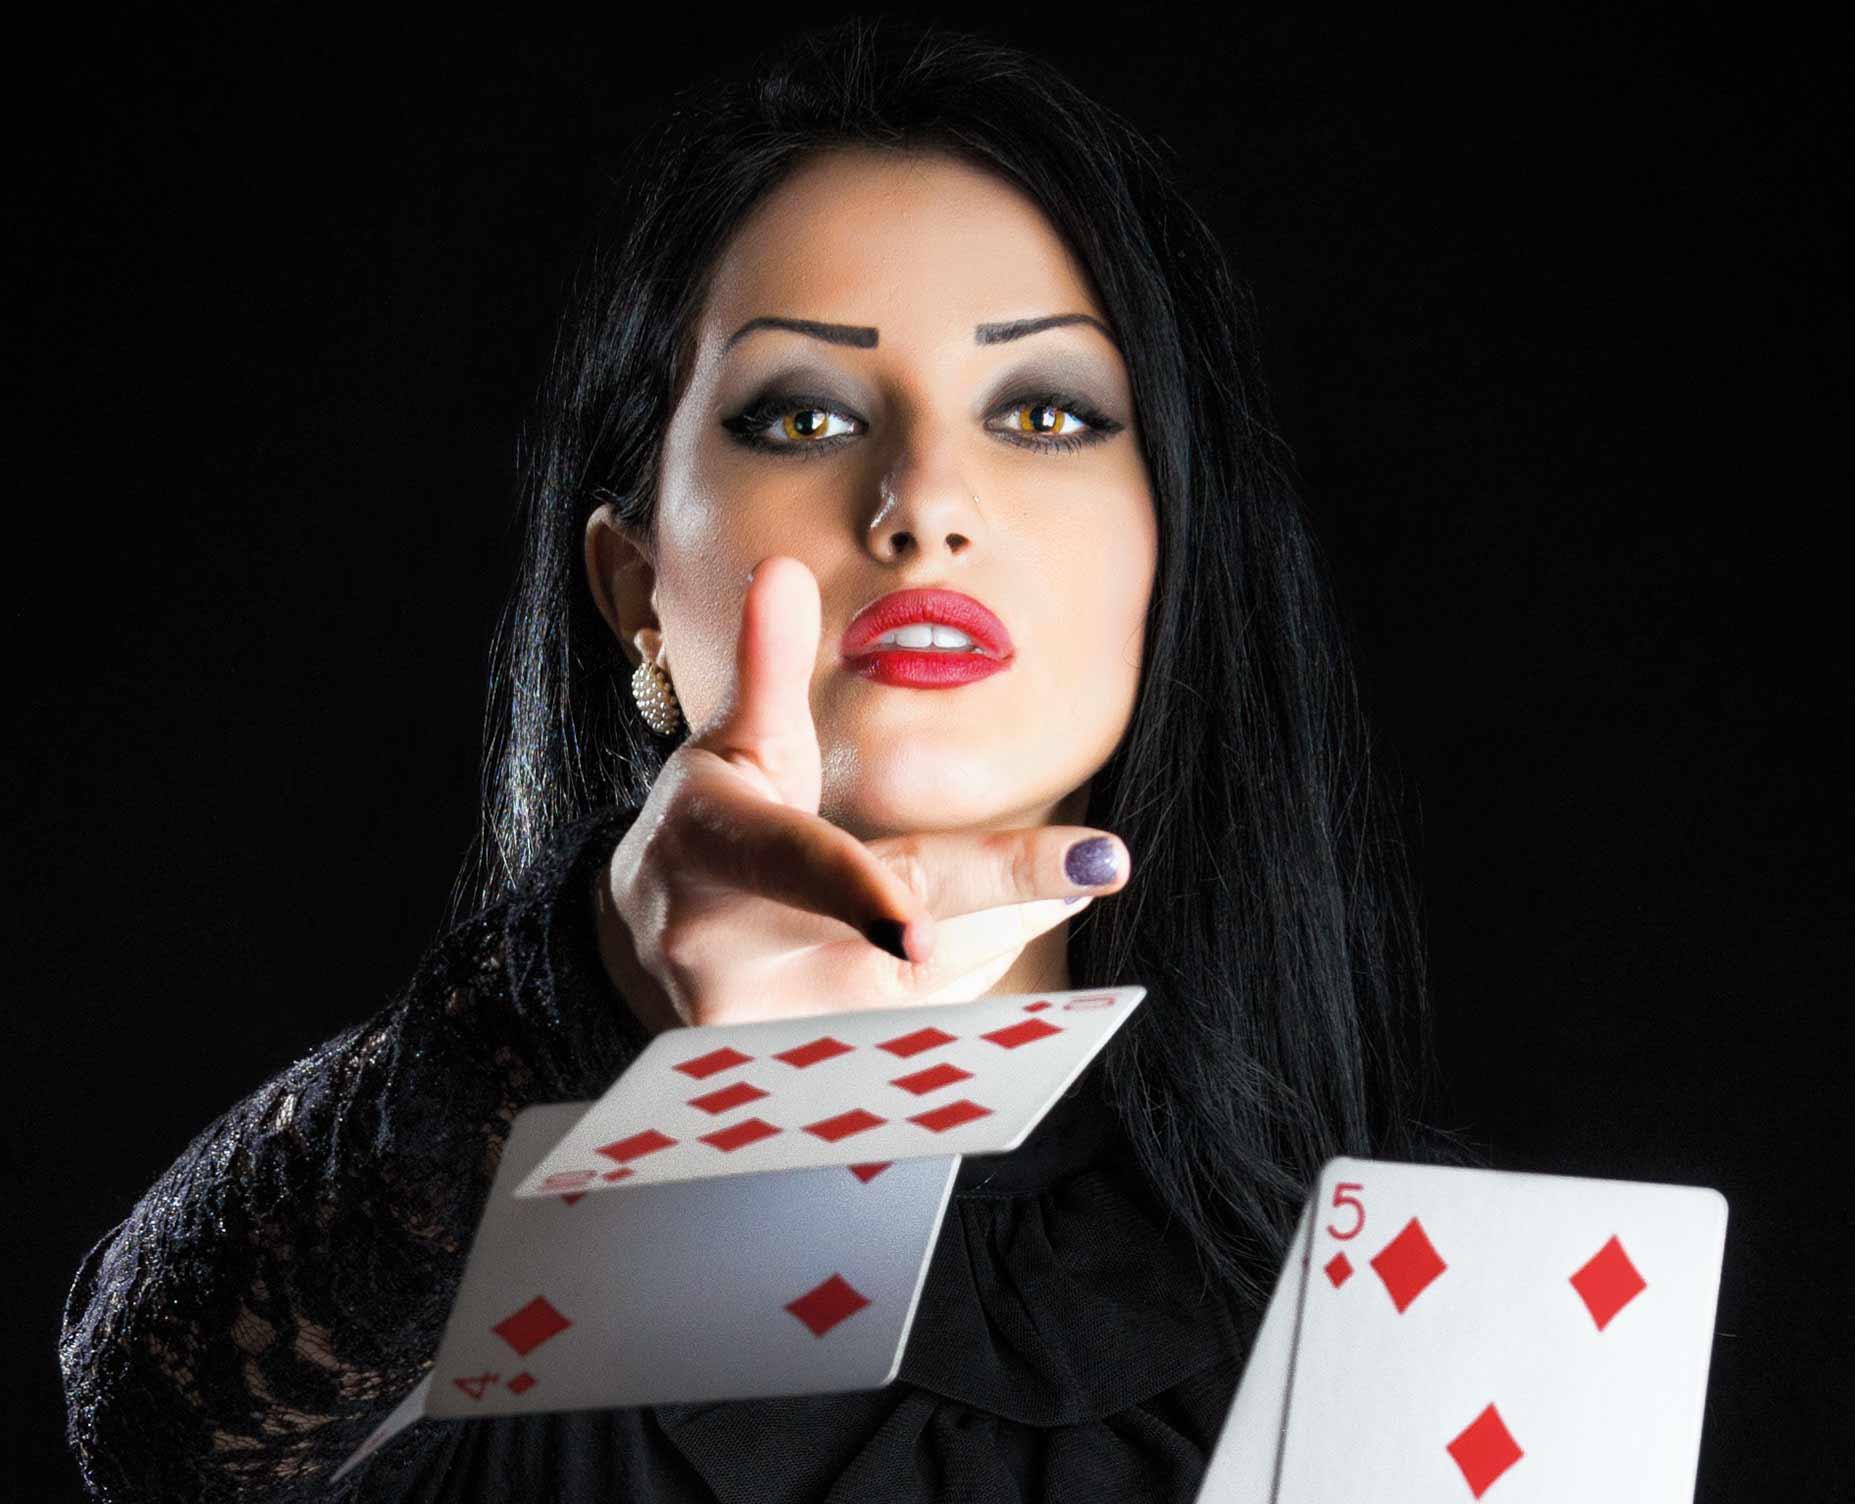 Image result for female gambling pics